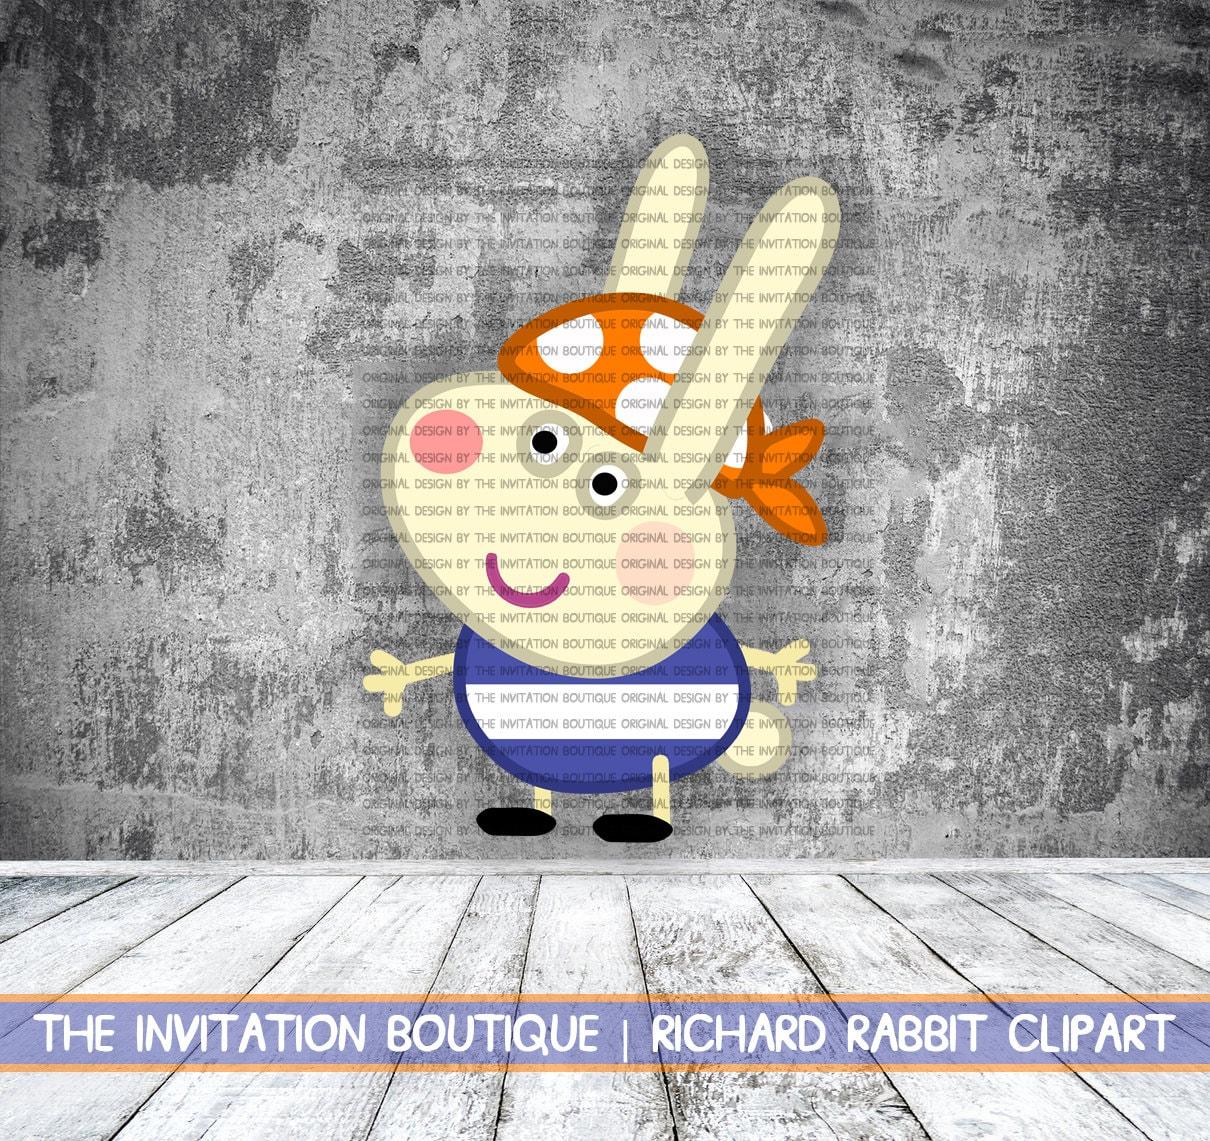 richard rabbit pirate peppa pig inspired clipart